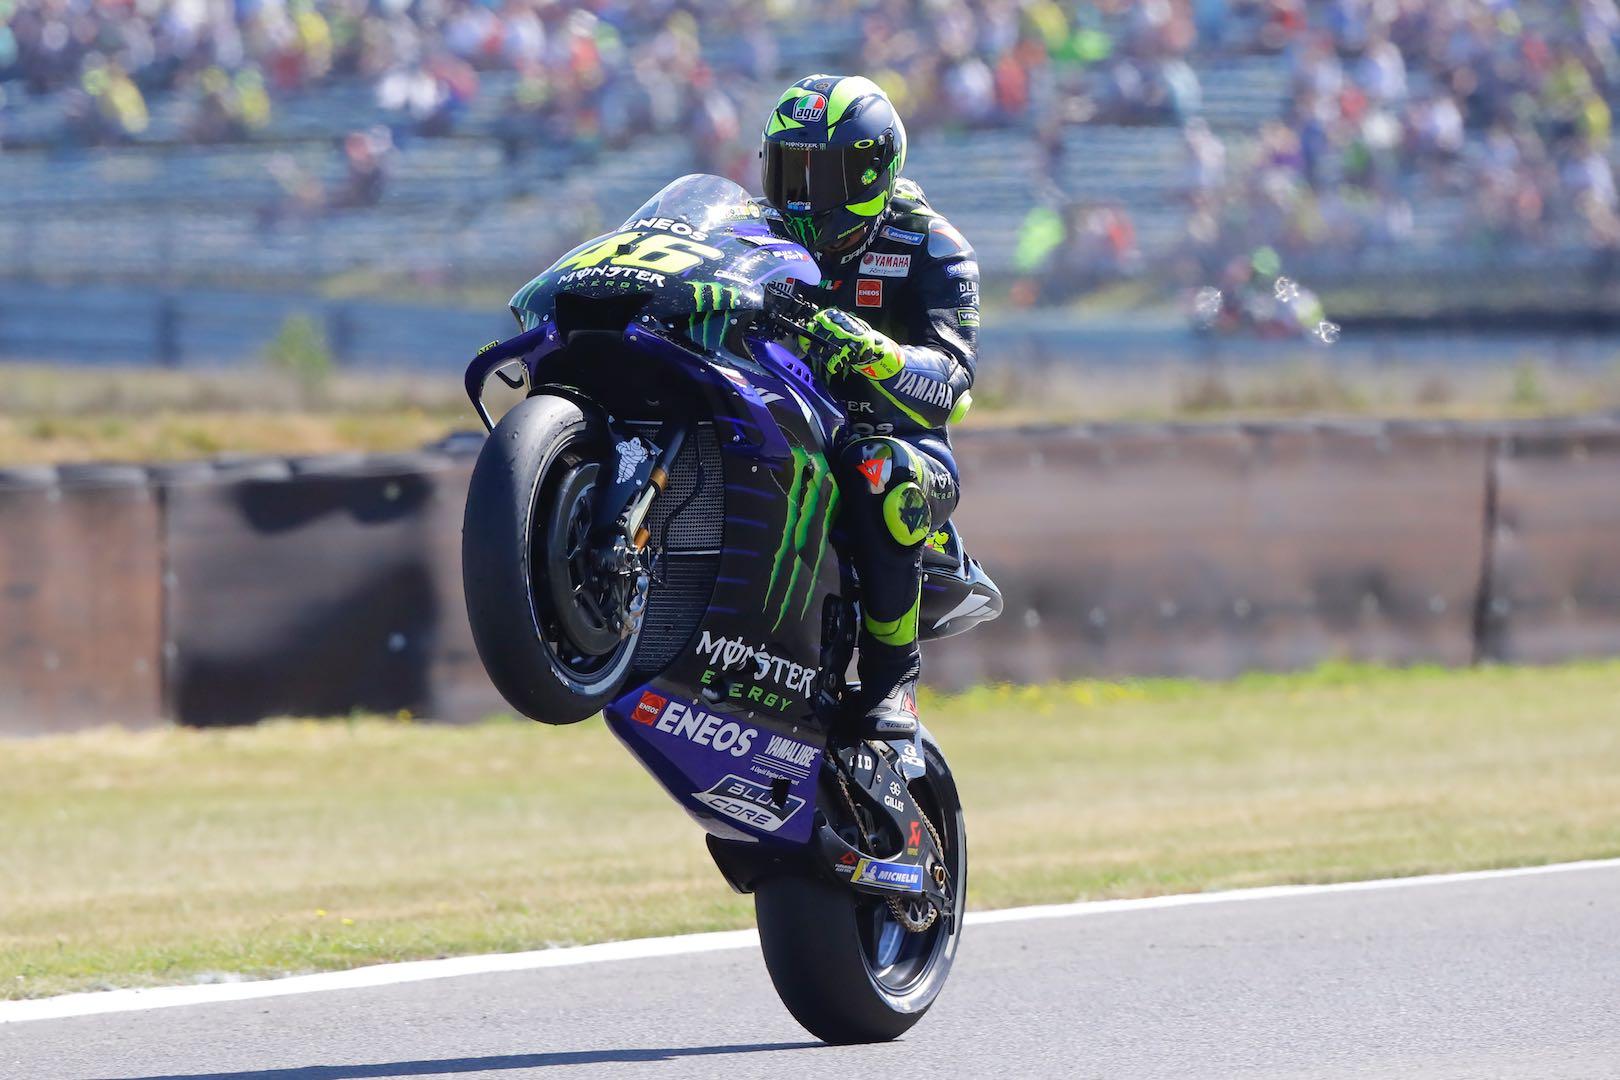 Yamaha's Valentino Rossi at MotoGP Qualifying 2019 Assen